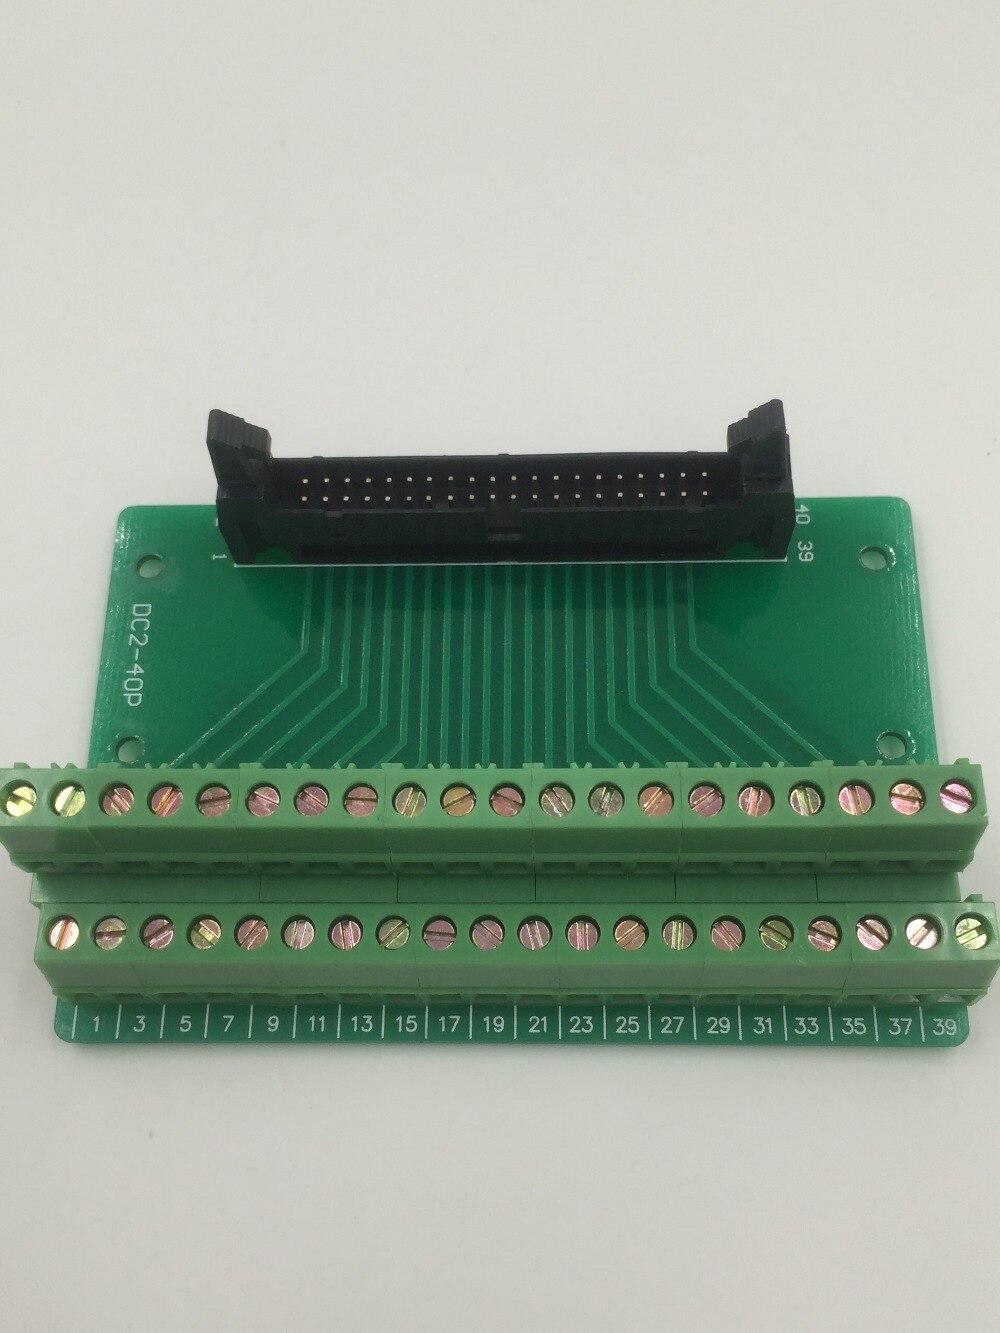 Hot Factory Direct Wholesale IDC40 male plug 40pin port header Terminal Breakout PCB Board block 2 row screw